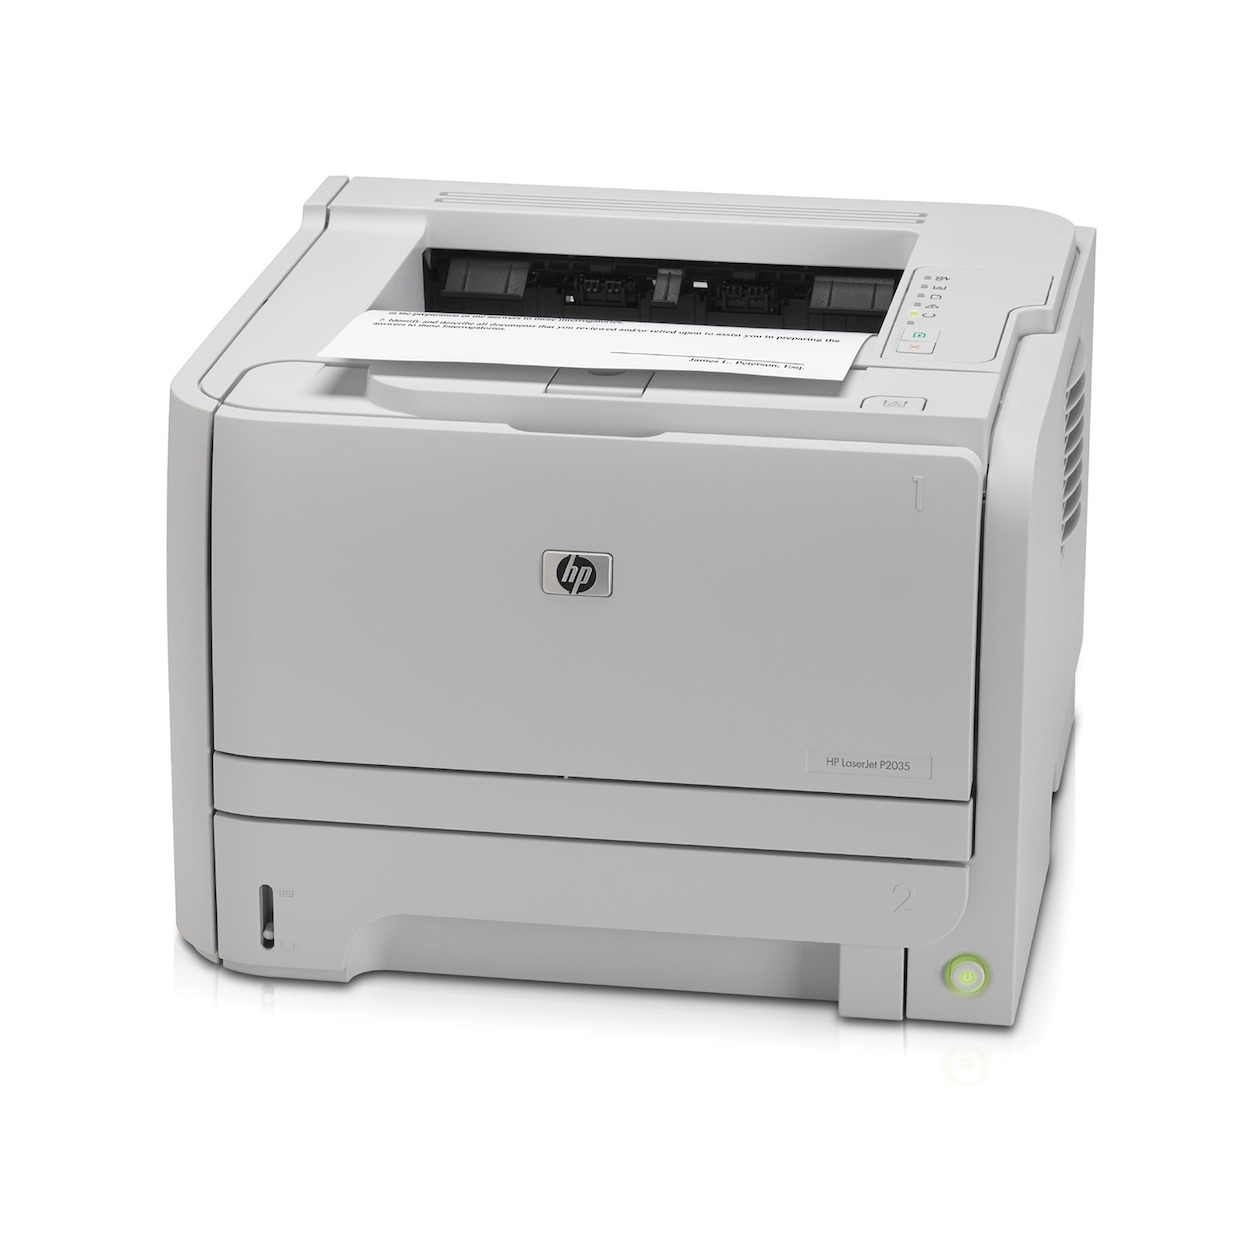 HP P2035A430PPMUSB